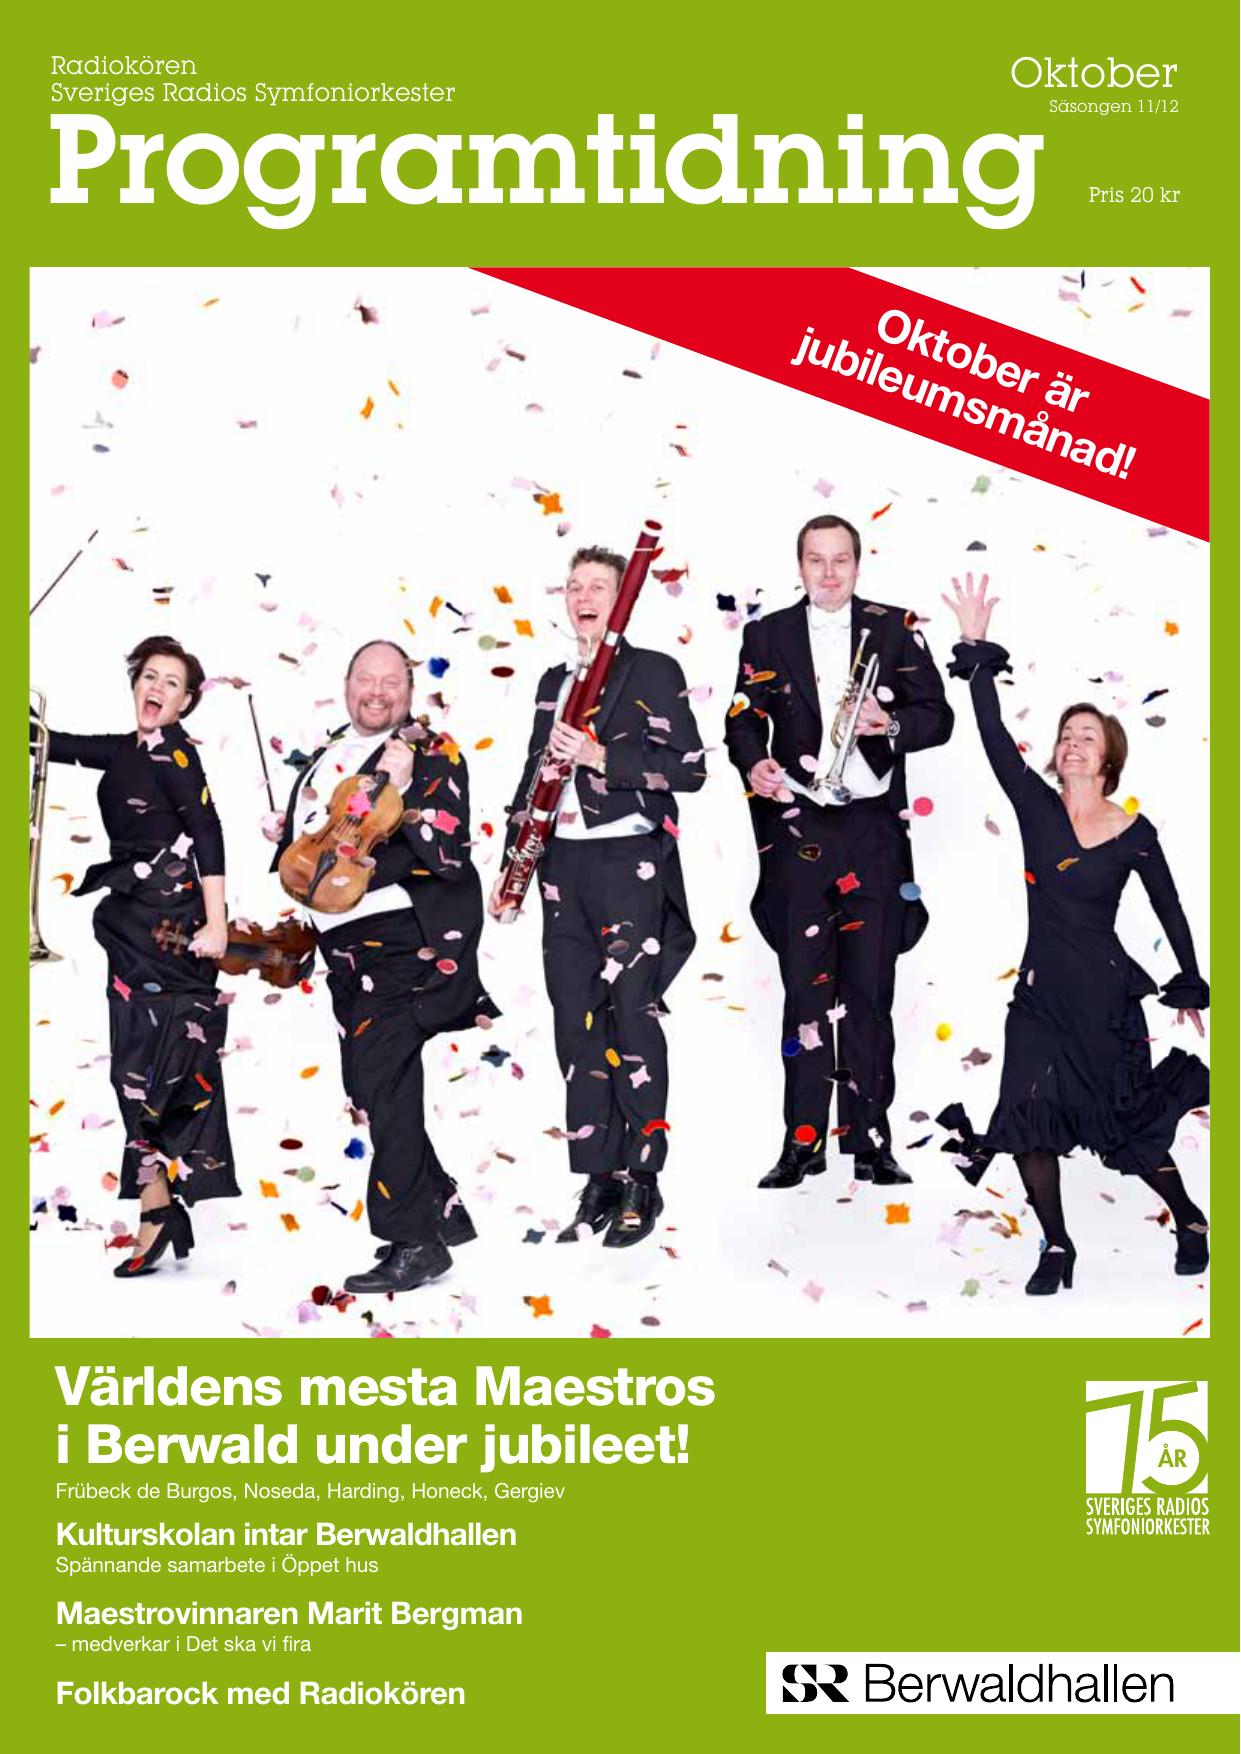 Finlands jubileum firas under arets ostersjofestival